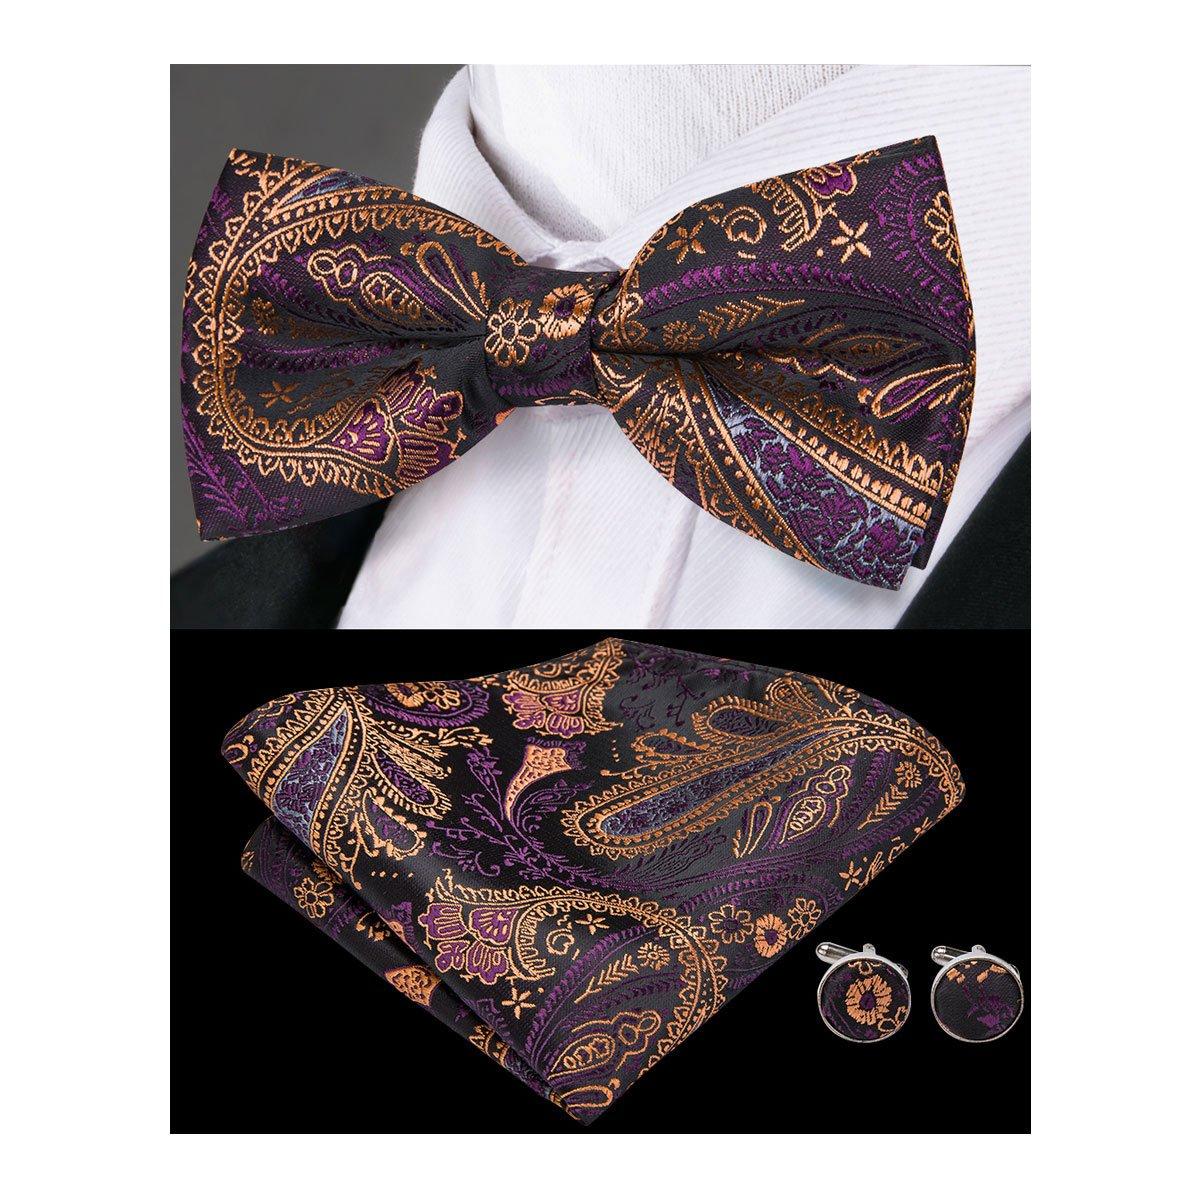 Hi-Tie Purple and Brown Paisley Mens Bowtie Hanky Cufflinks Formal Wedding Bow Tie Set